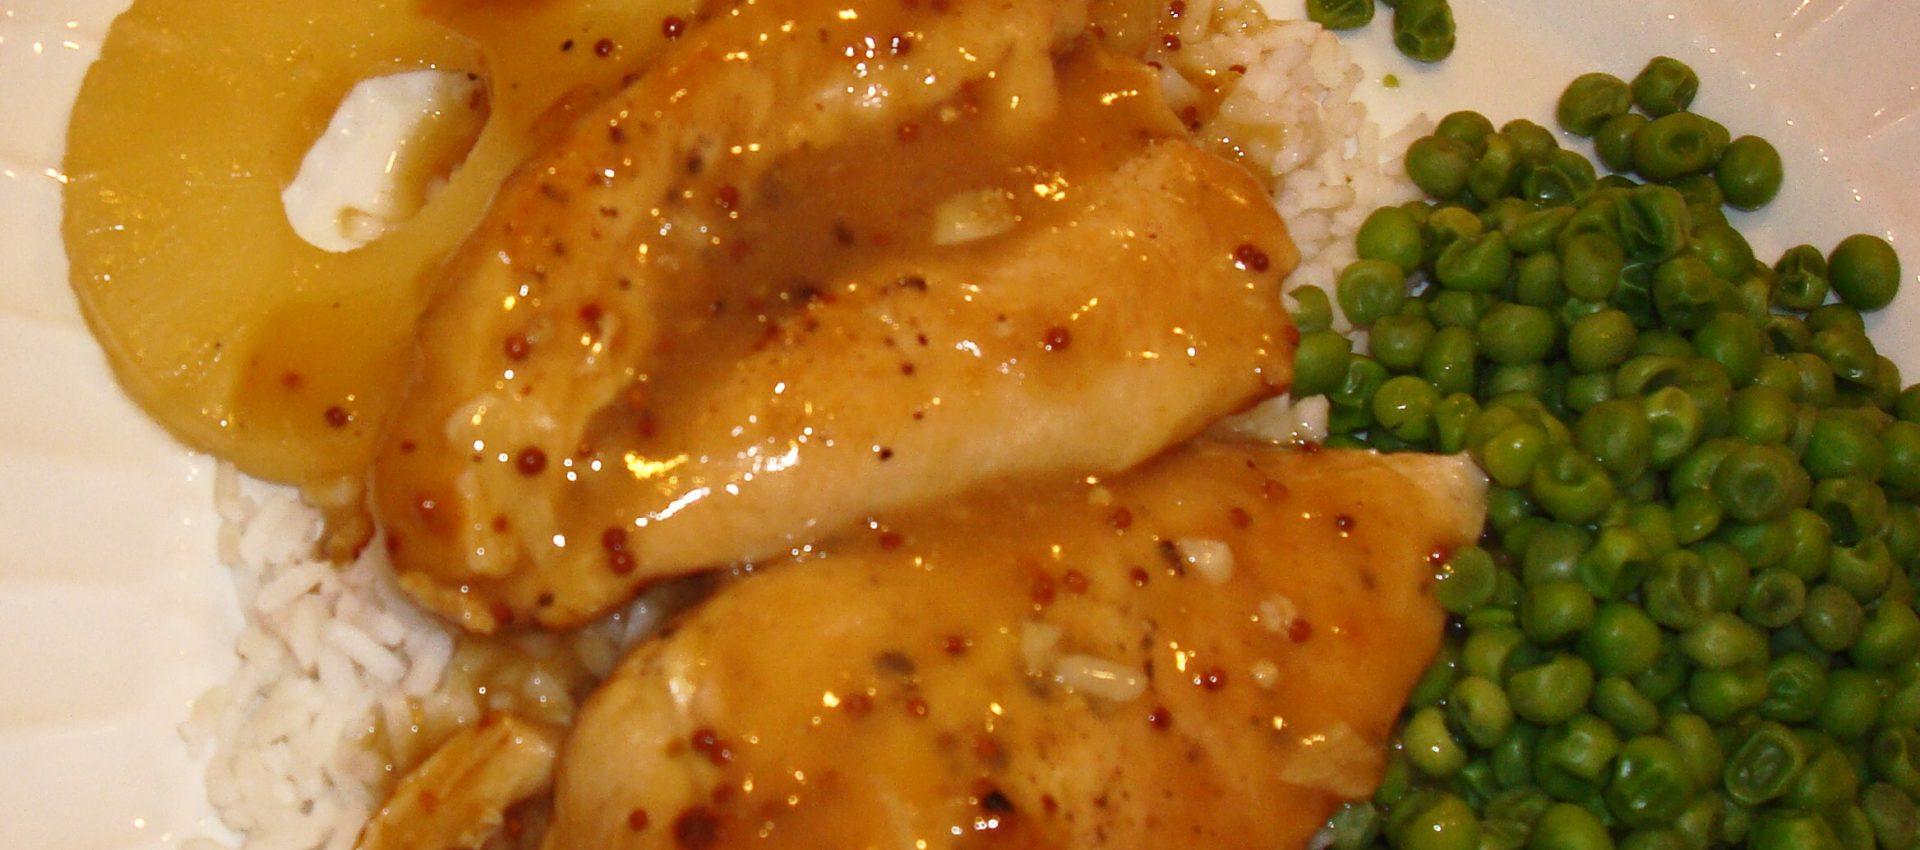 Easy Chicken Breasts